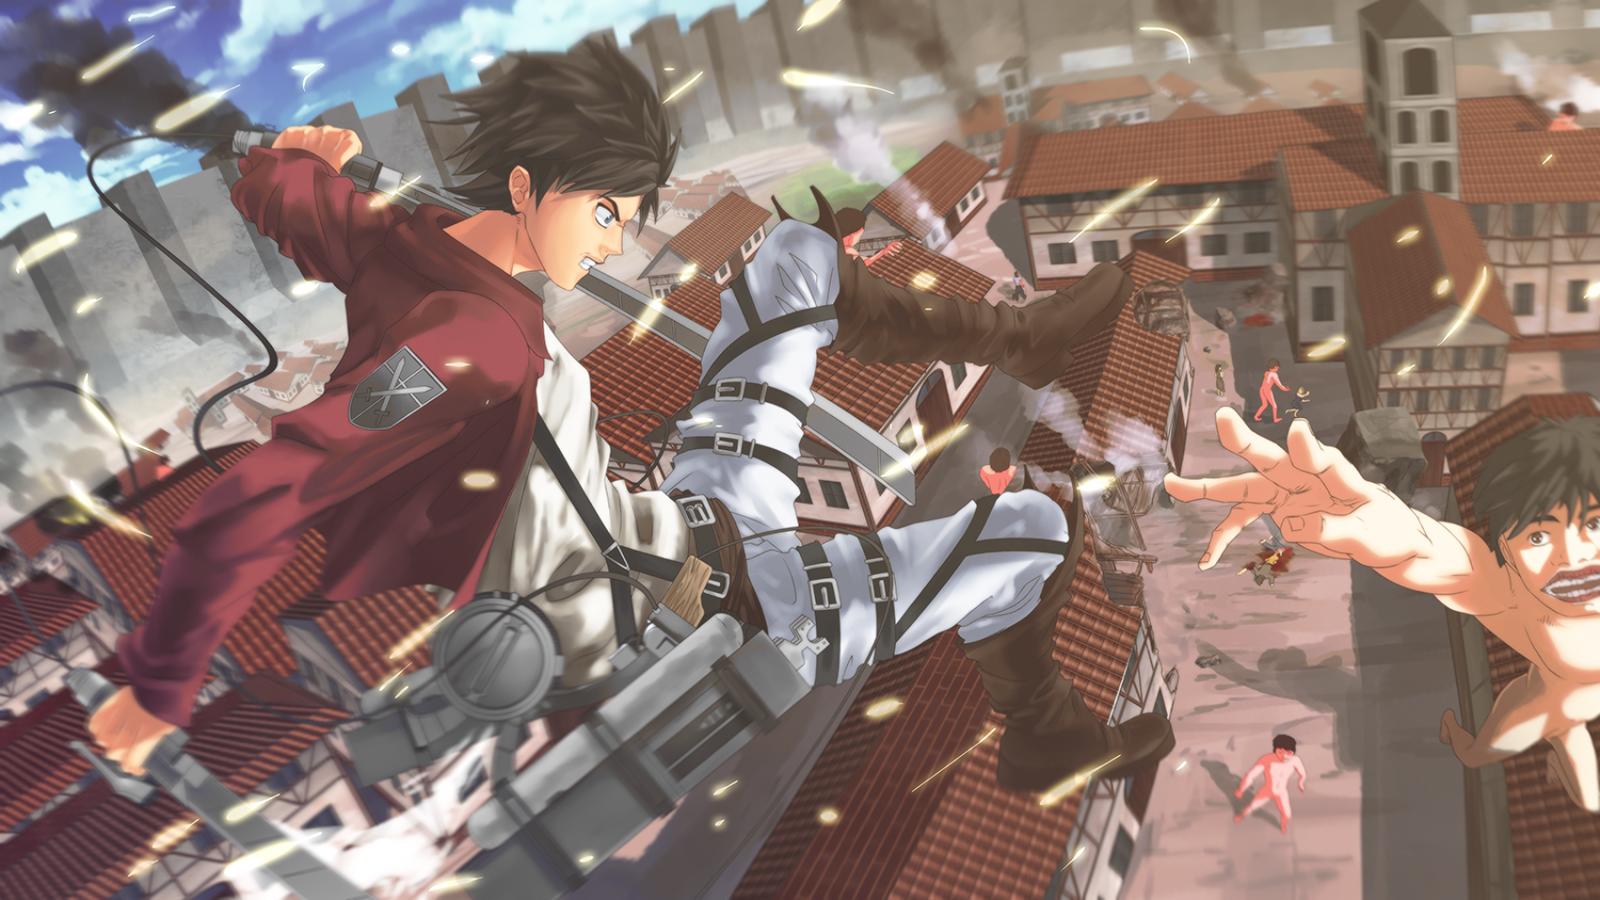 on Titan Shingeki no Kyojin Eren Jaeger Anime Sword Blade HD Wallpaper 1600x900